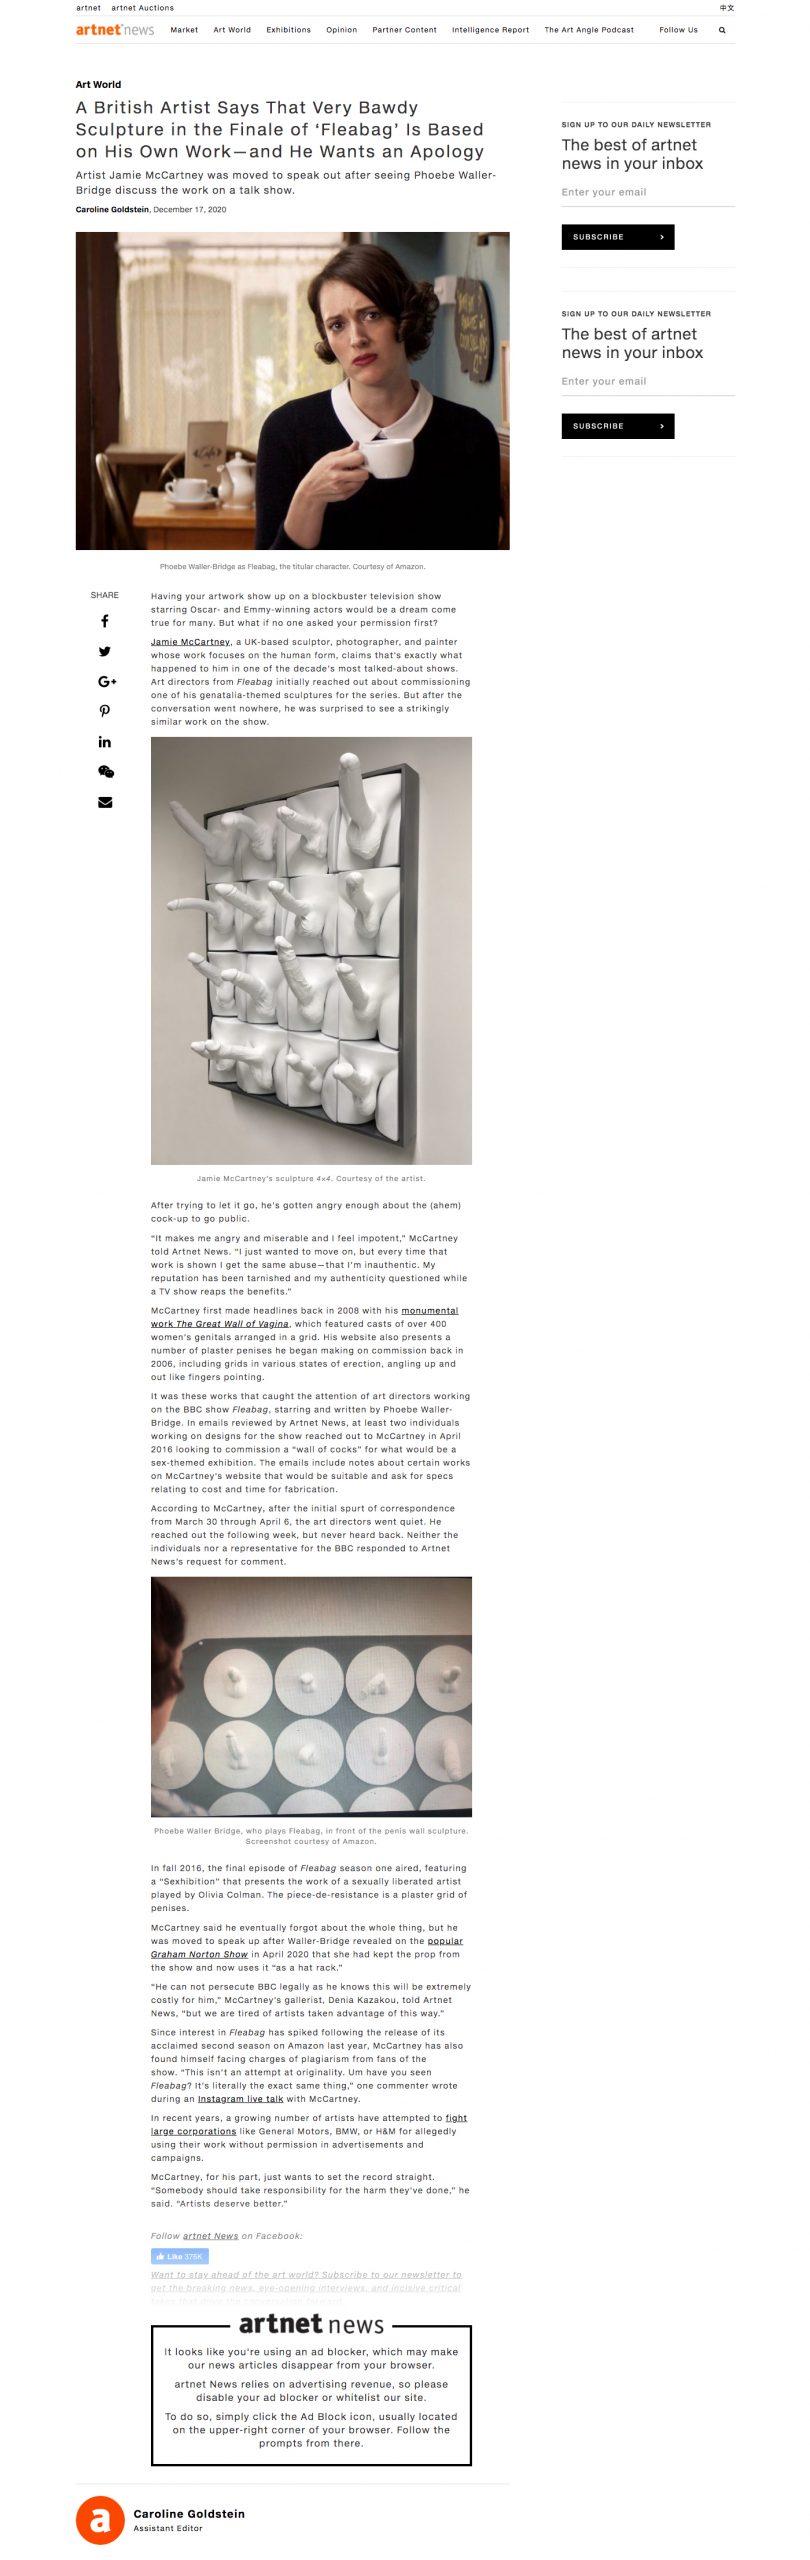 Artnet News on Fleabag stealing Jamie McCartney's work